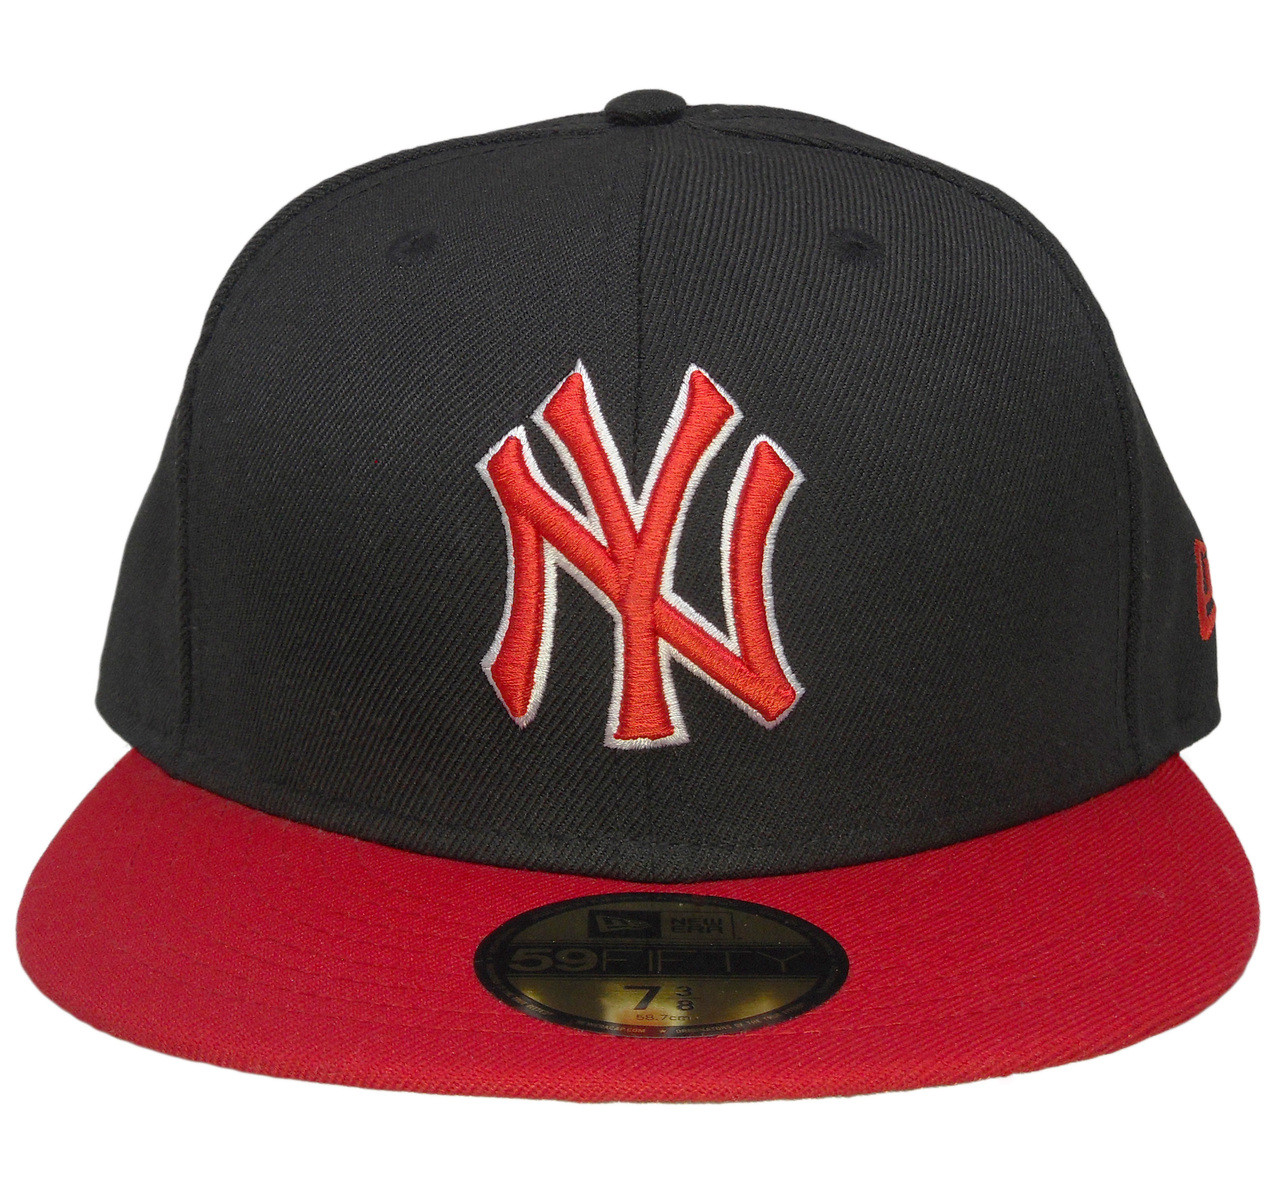 4a571687ab5 New York Yankees New Era 59Fifty Custom Fitted Hat - Black